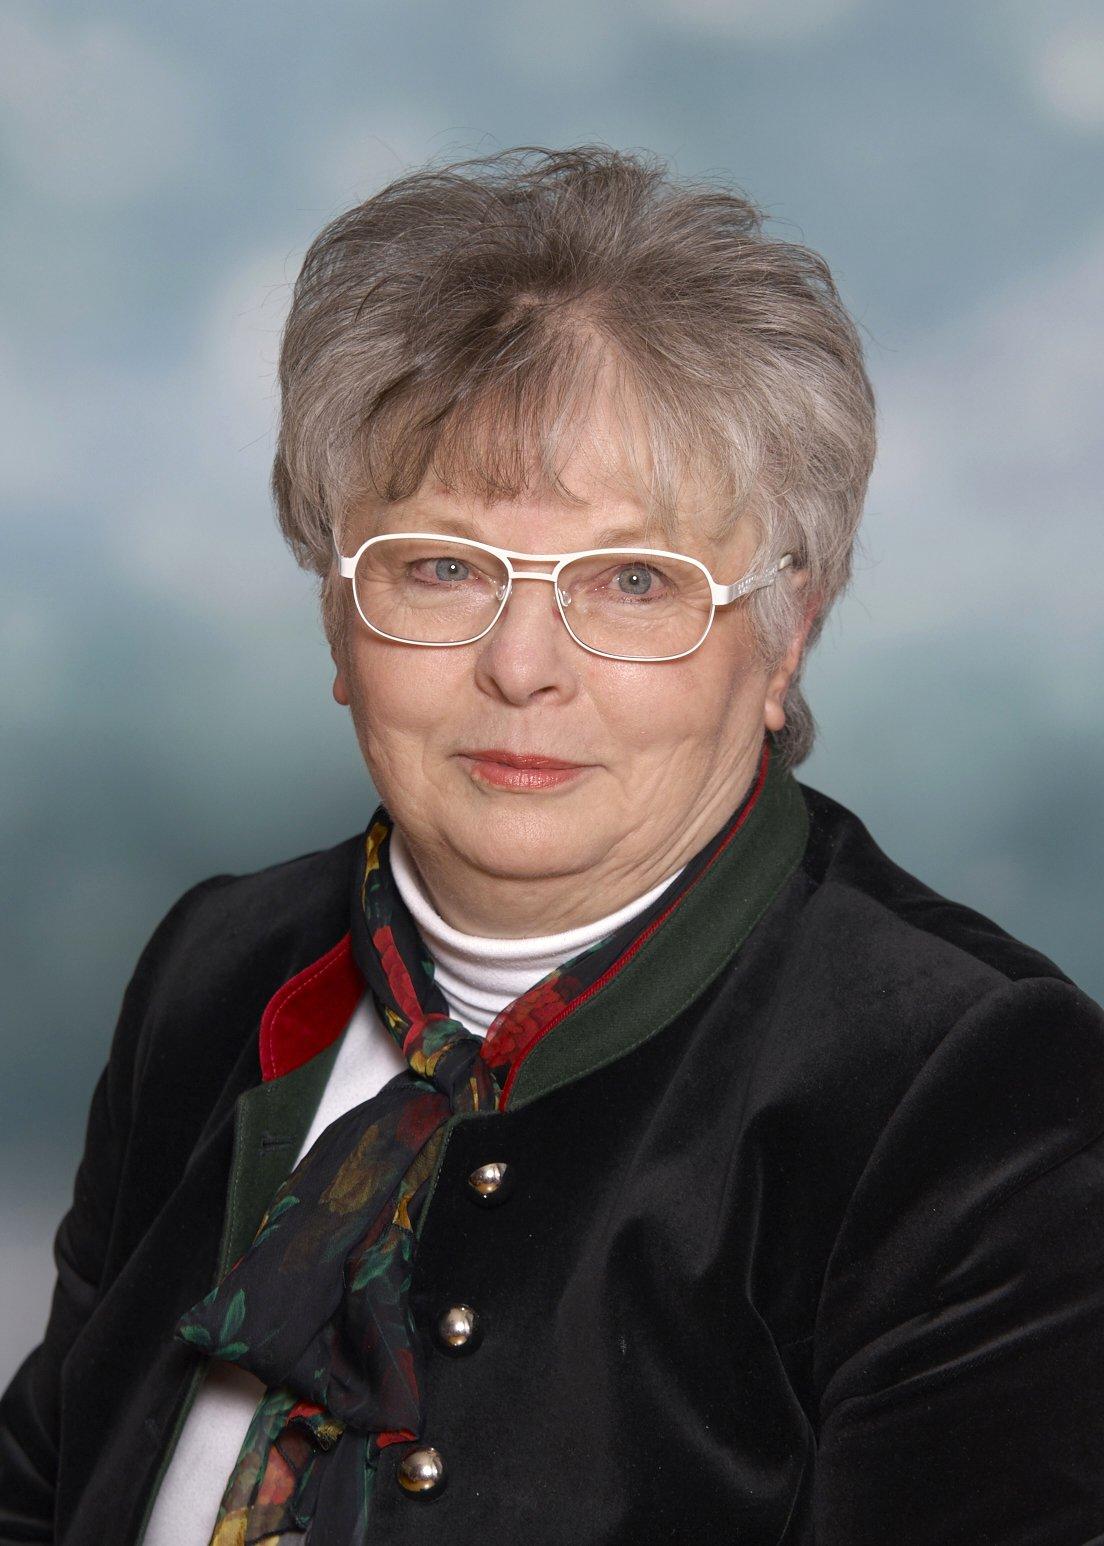 Christina Herbrich